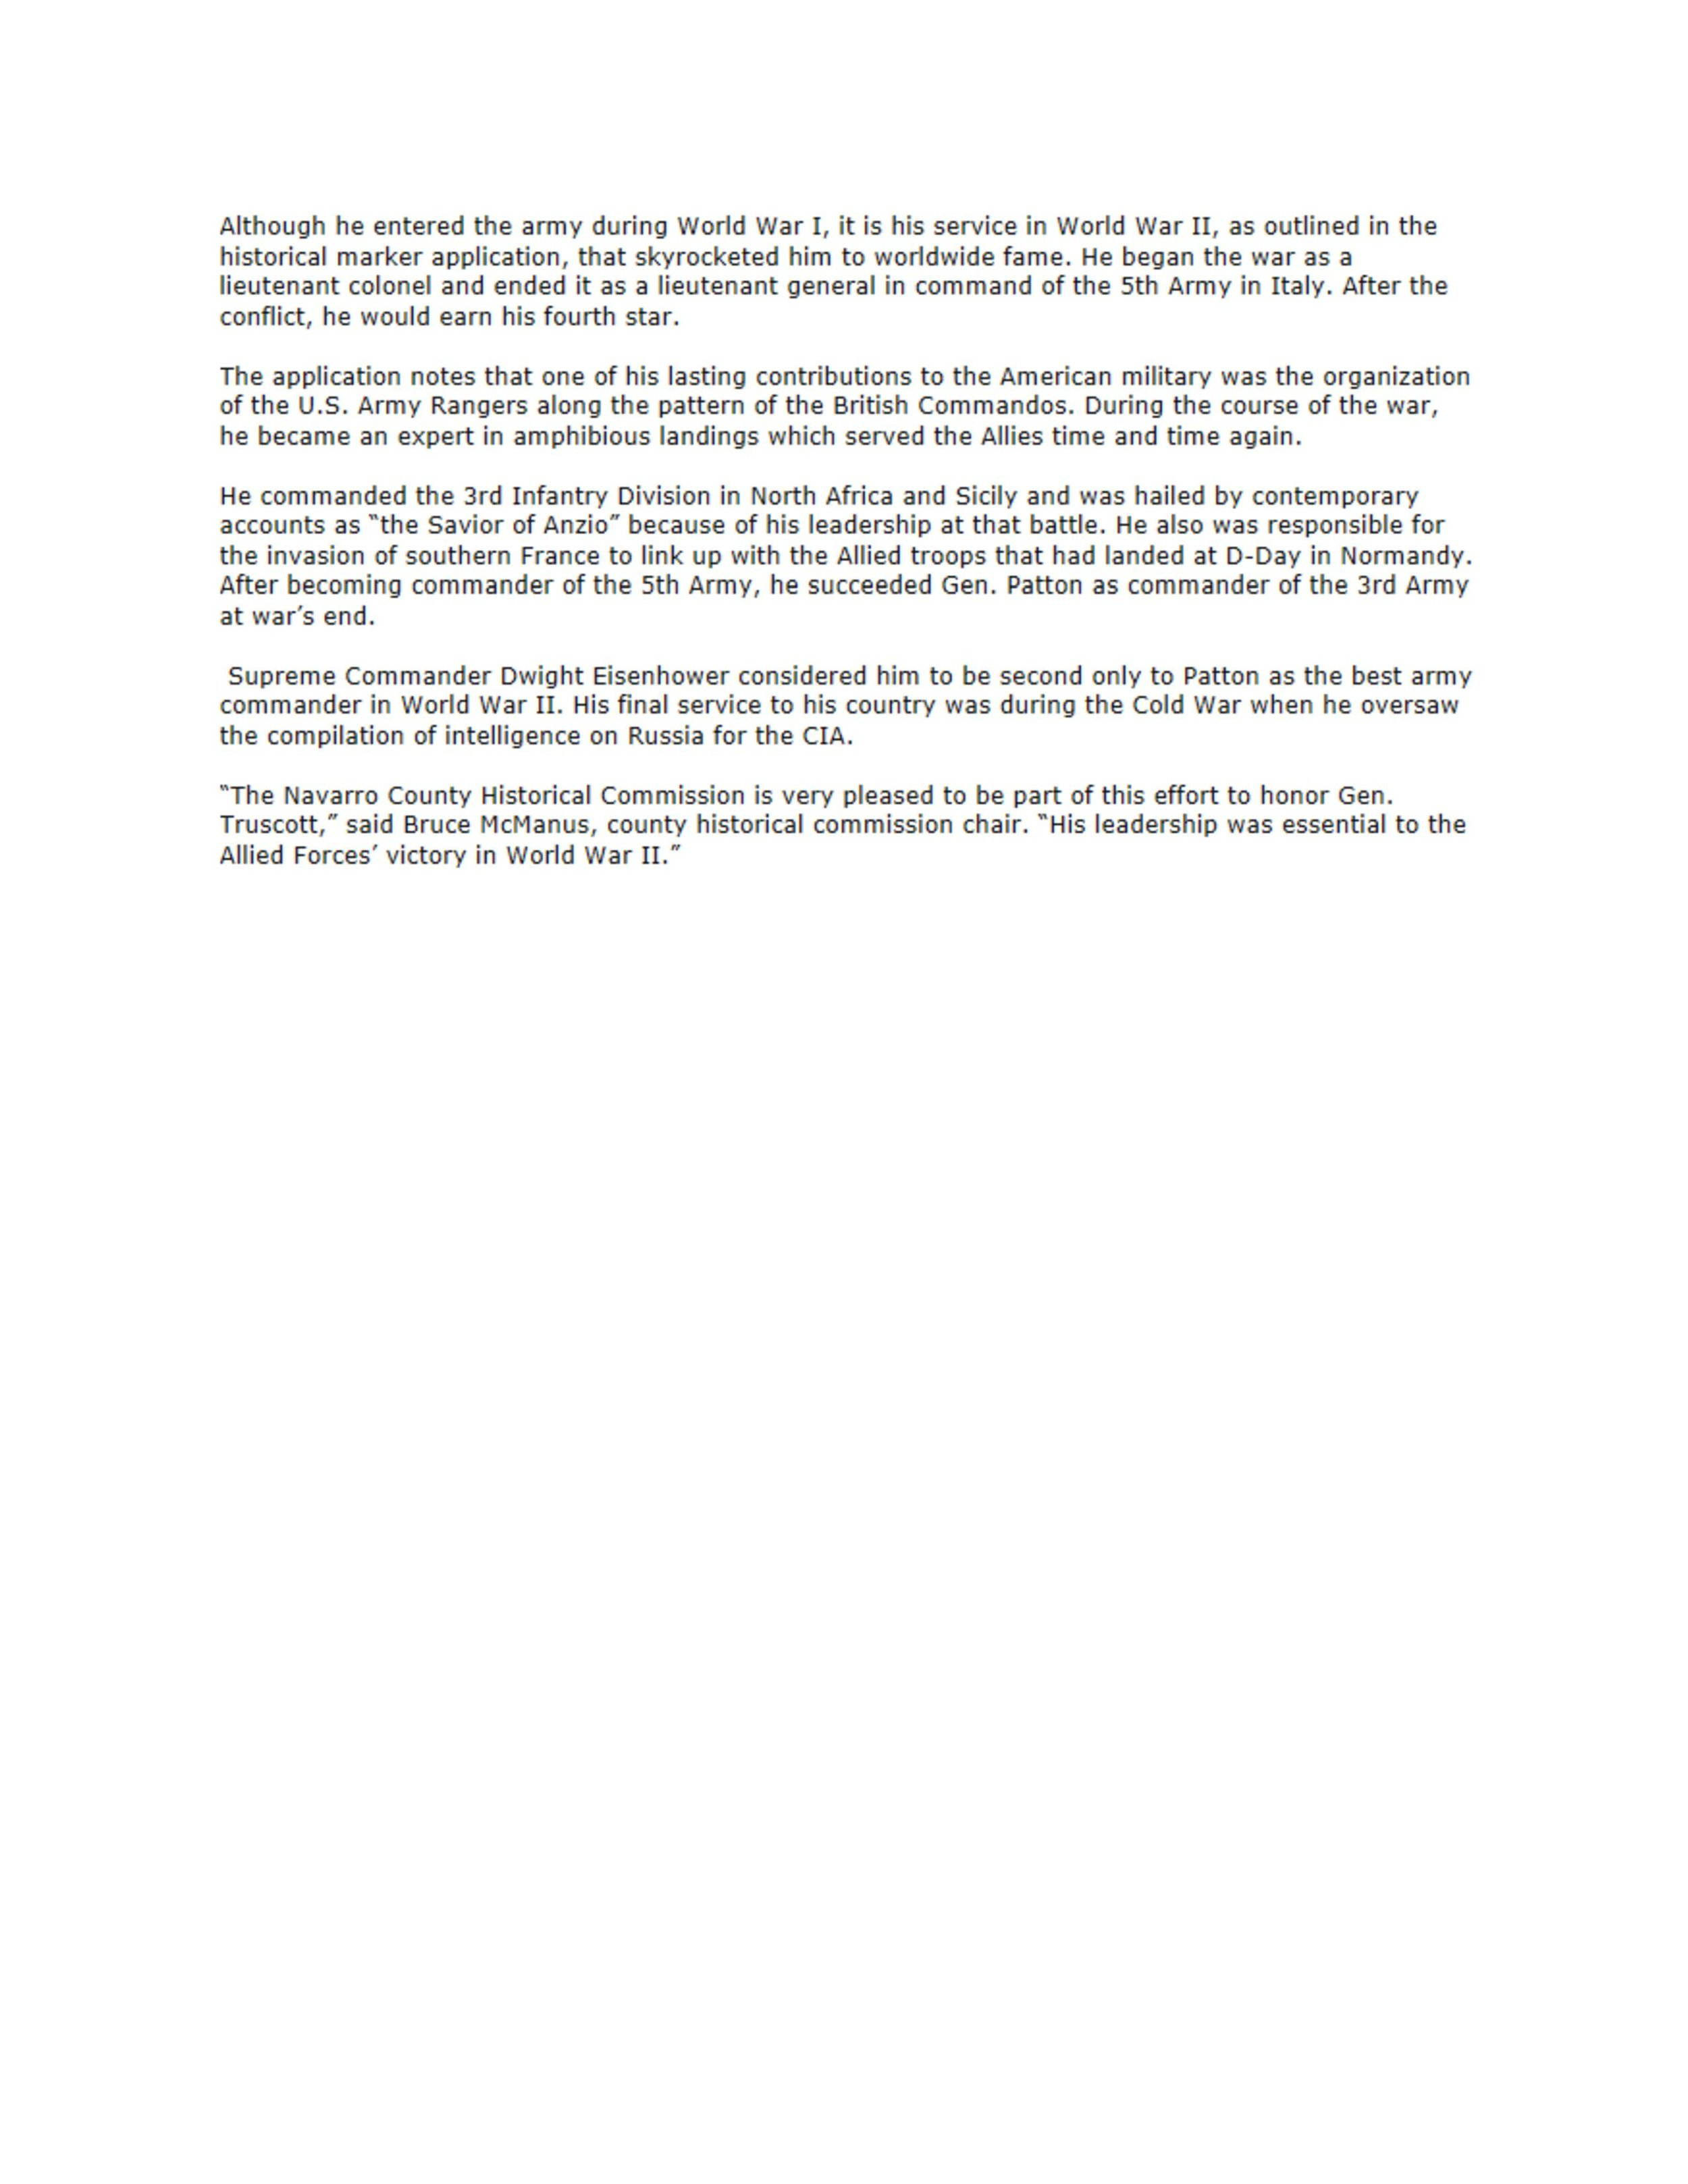 Truscott - Corsicana Daily Sun Article 01-01-2012-page-002.jpg